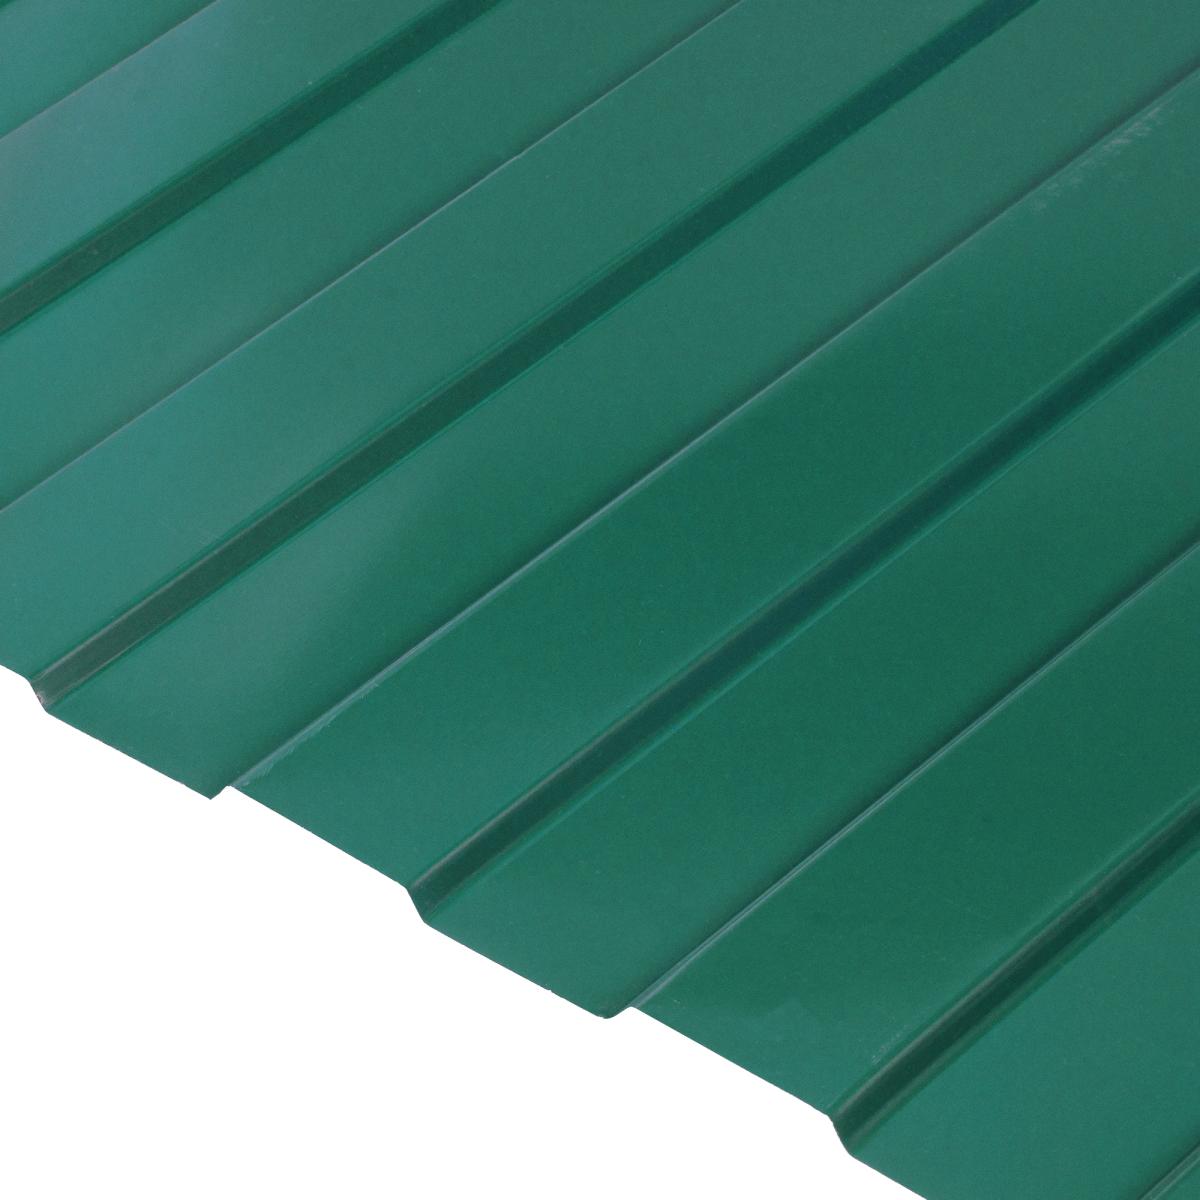 Профнастил С8 0.45 мм 1200х2000 мм зеленый RAL 6005